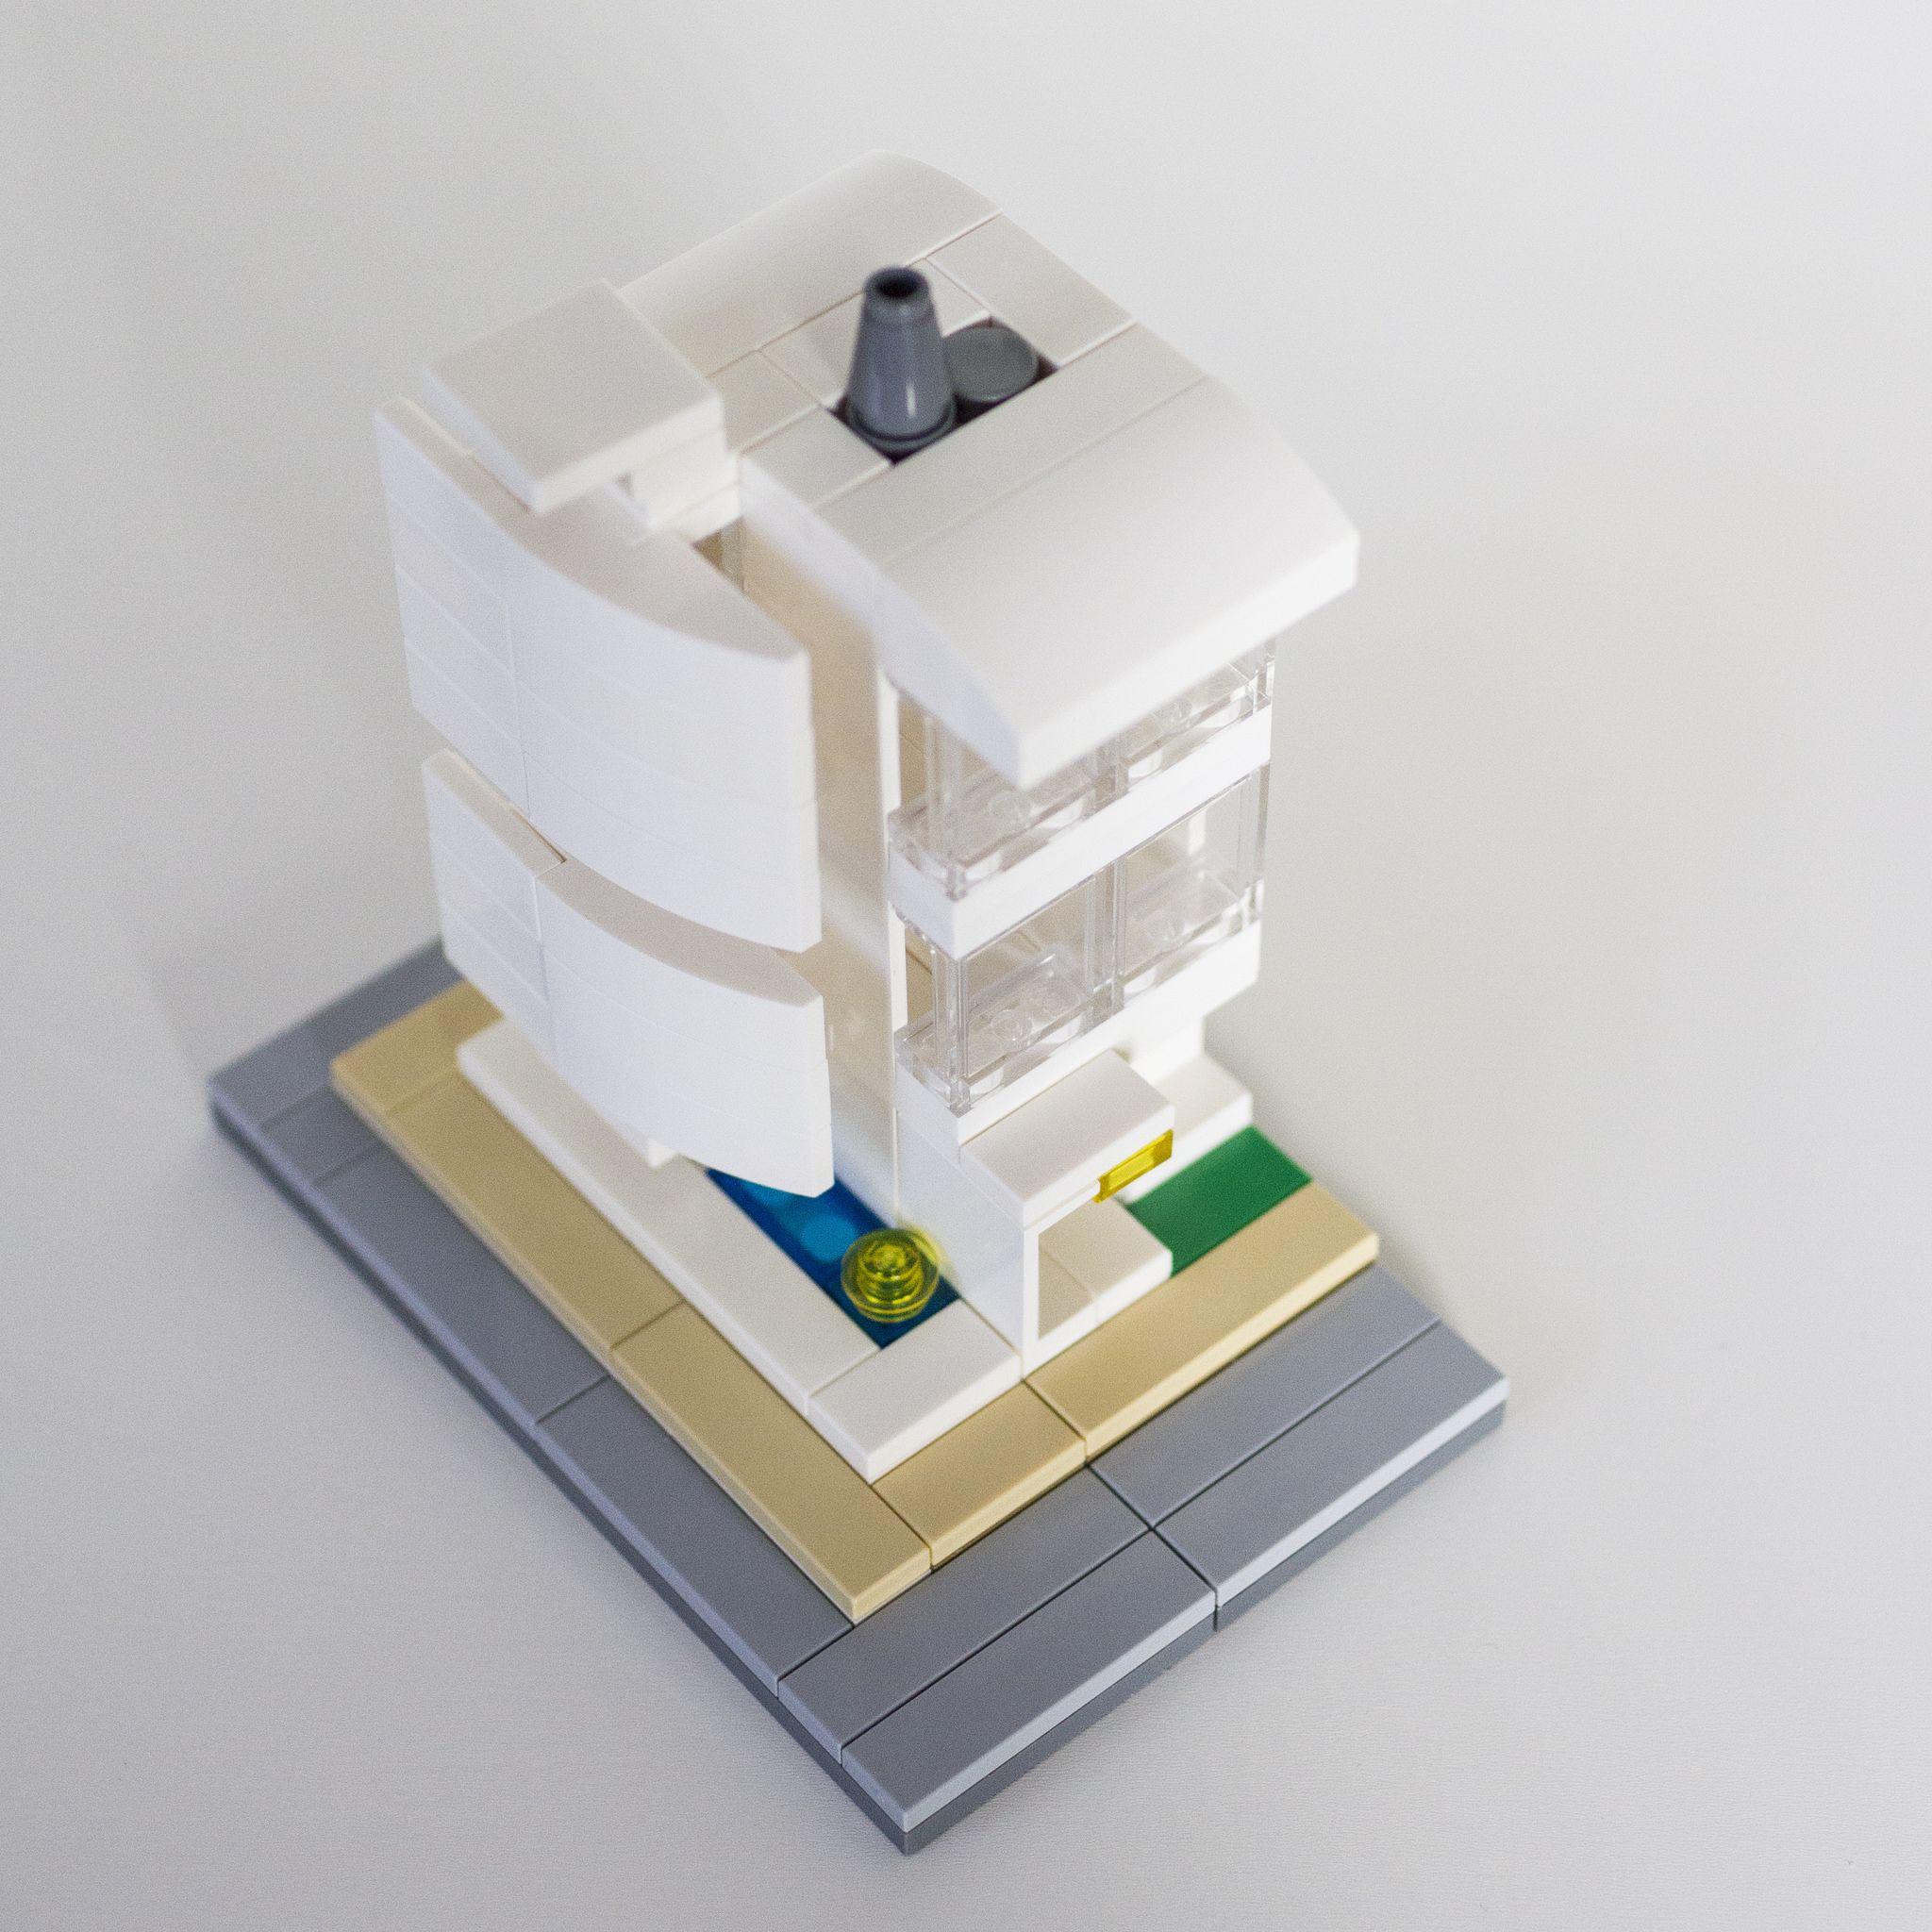 _MG_4878 | Lego, Lego architecture and Lego ideas